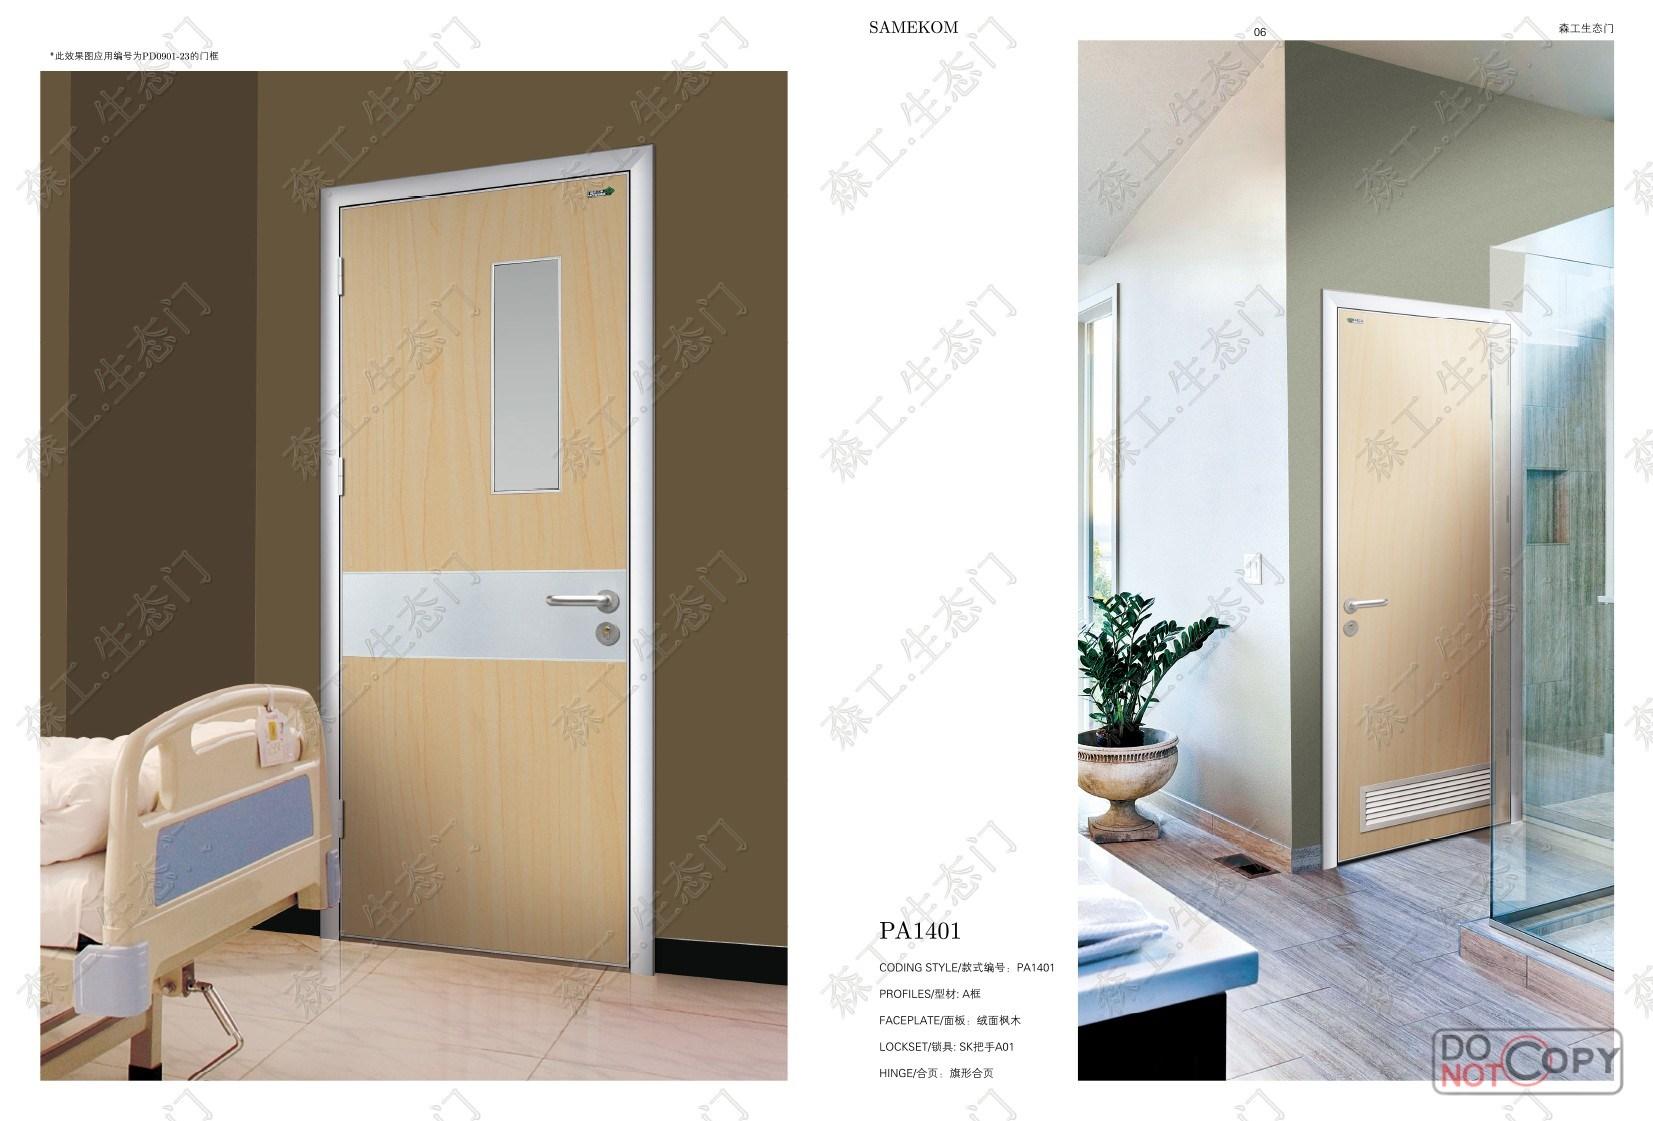 China Aluminum Frame Hospital Design Swing Door - China Hospital ...